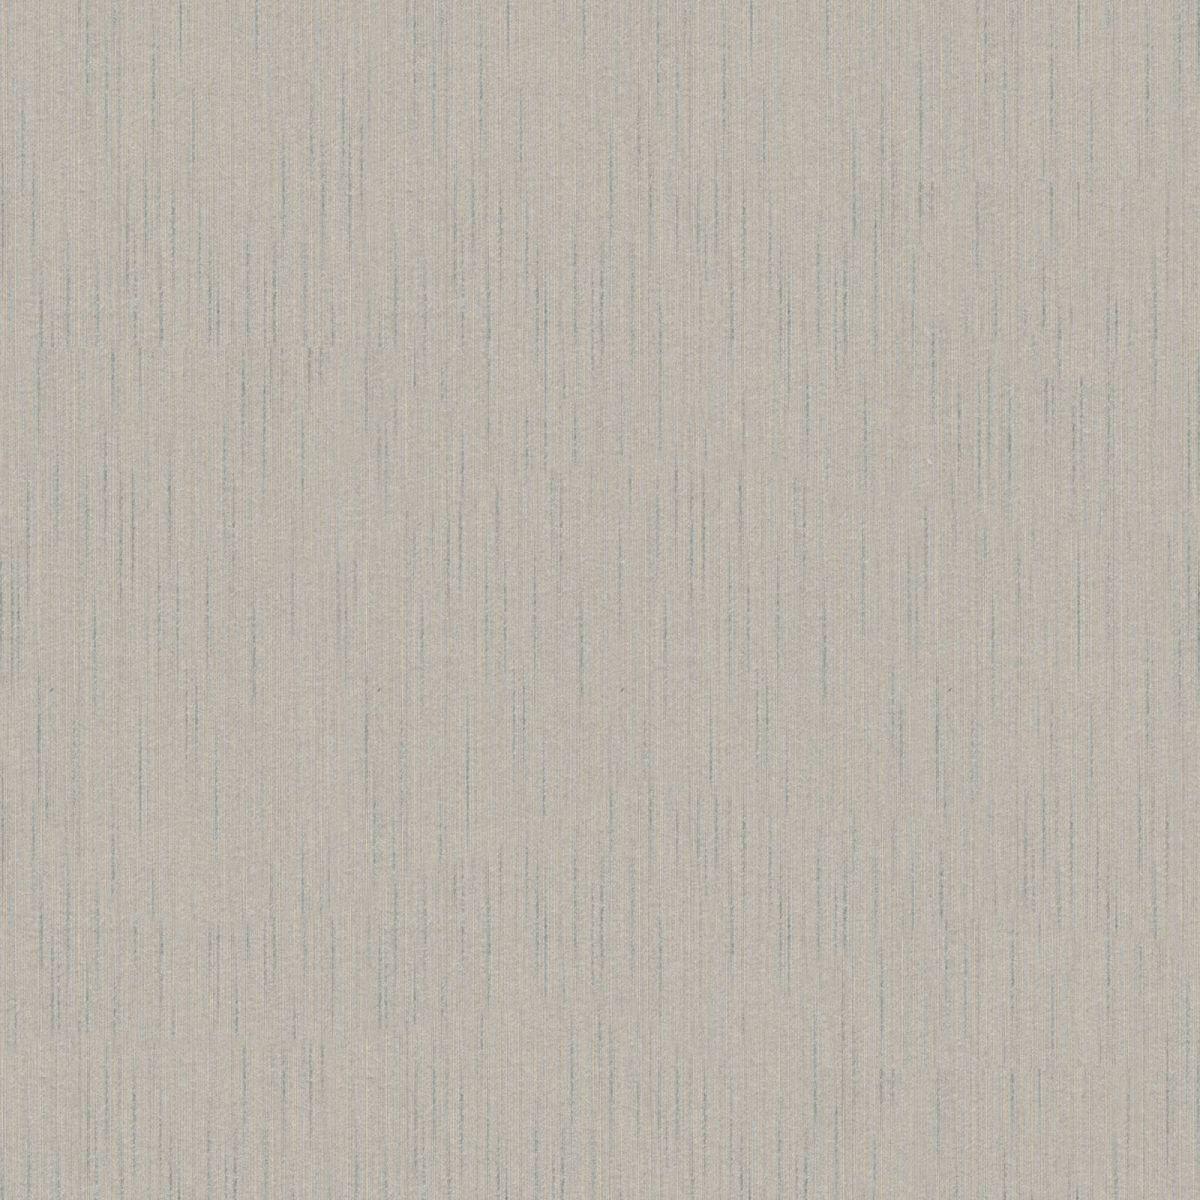 stofftapete tessuto 2 architects paper 9685 17 tessuto 2 decowunder. Black Bedroom Furniture Sets. Home Design Ideas